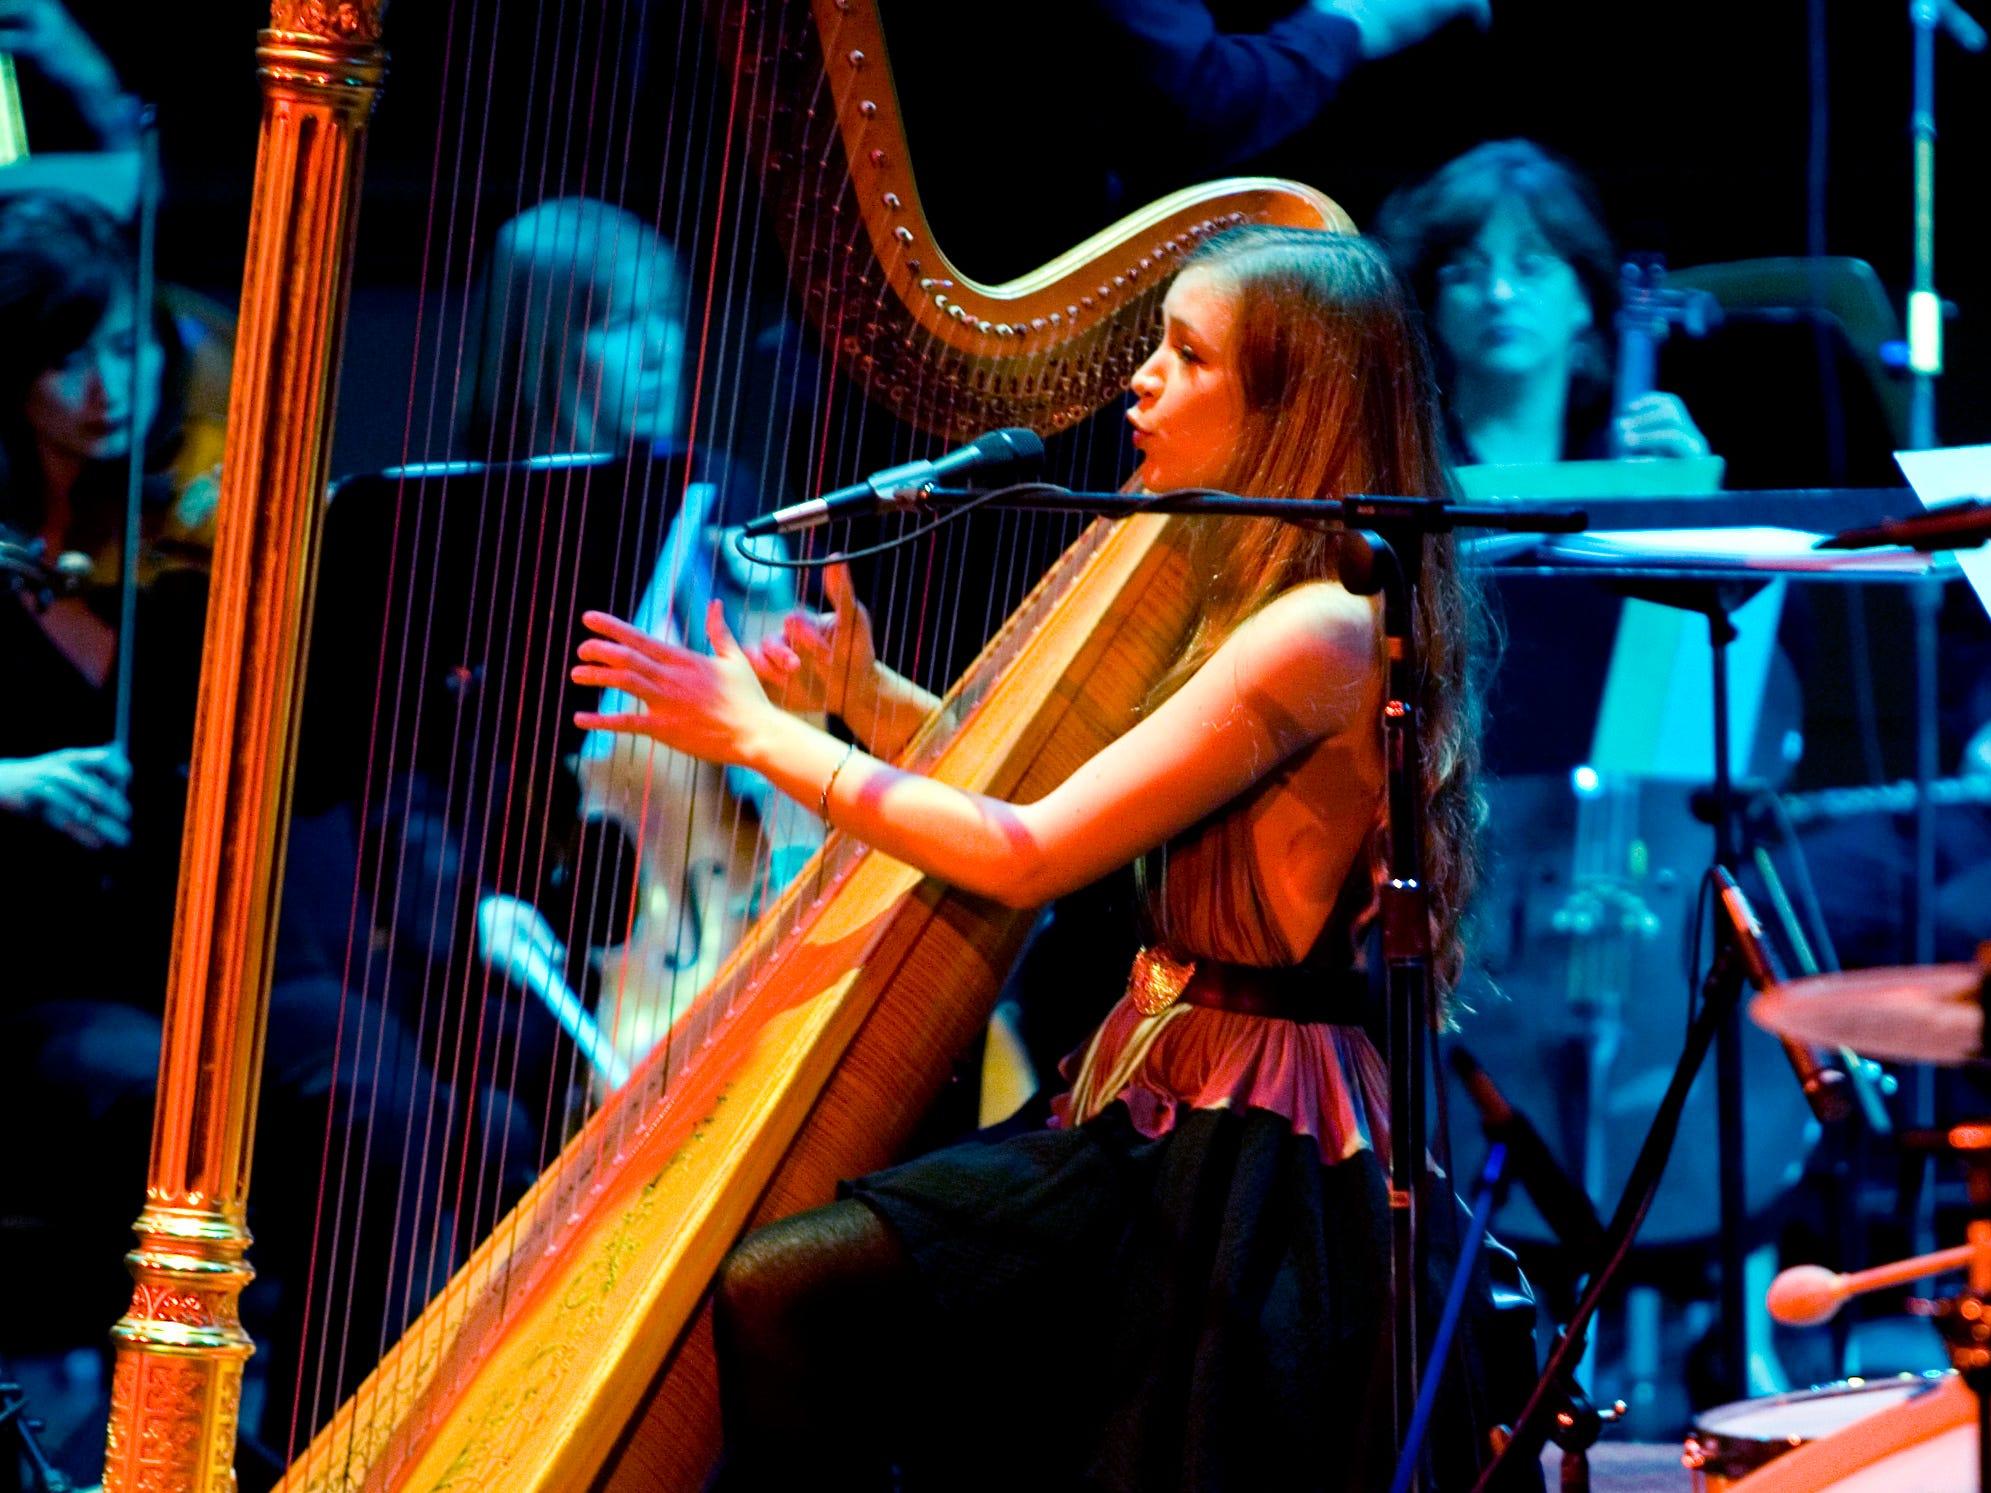 Newsom, enc, lynn, 1.-Joanna Newsom performs at the Pabst Theatre in Milwaukee Sunday October 21, 2007.  Photo by Tom Lynn/TLYNN@JOURNALSENTINEL.COM